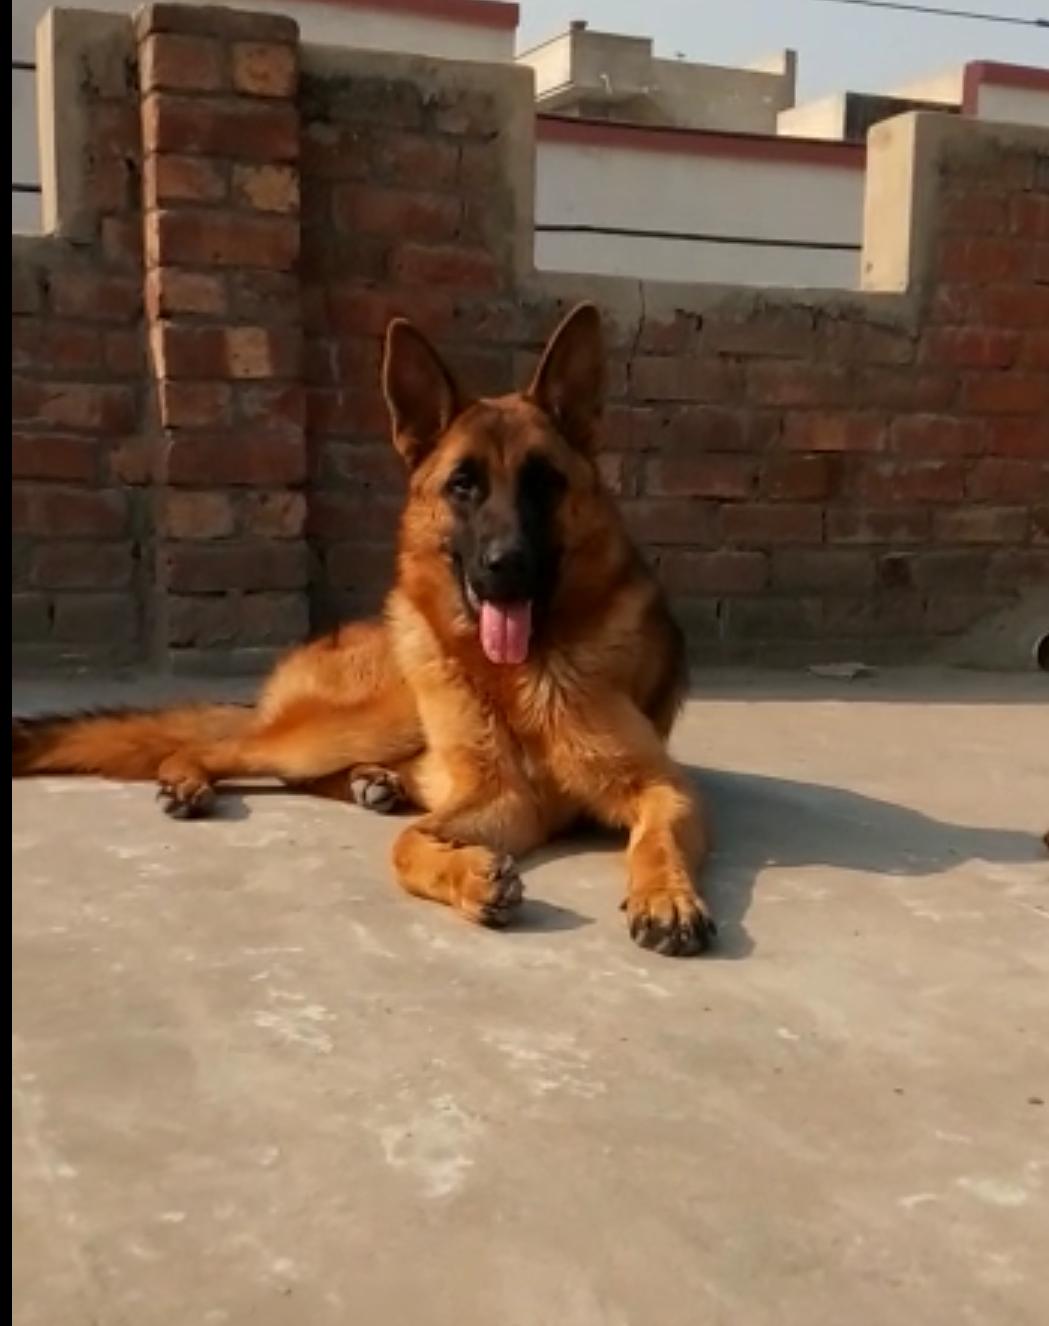 public/dog_images/12875/1612290573.IMG_20210129_012749.png